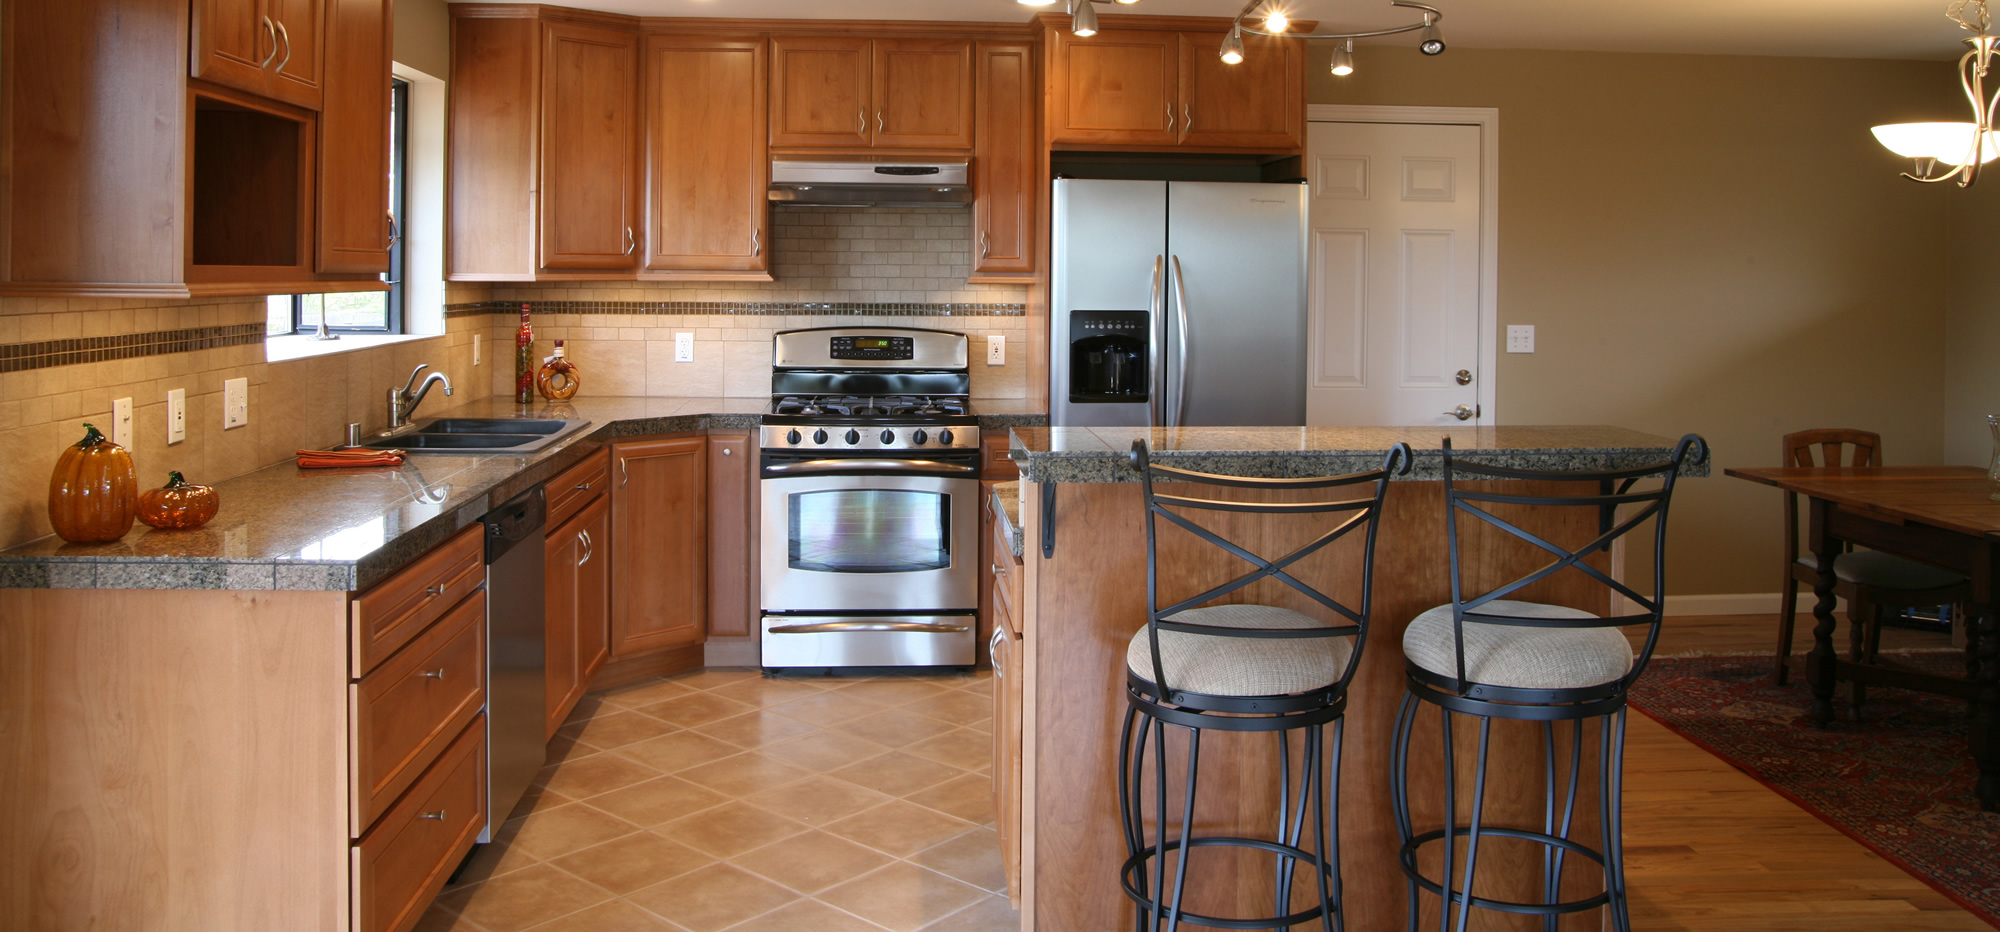 New Kitchen Today Florida | kitchen cabinets miami florida